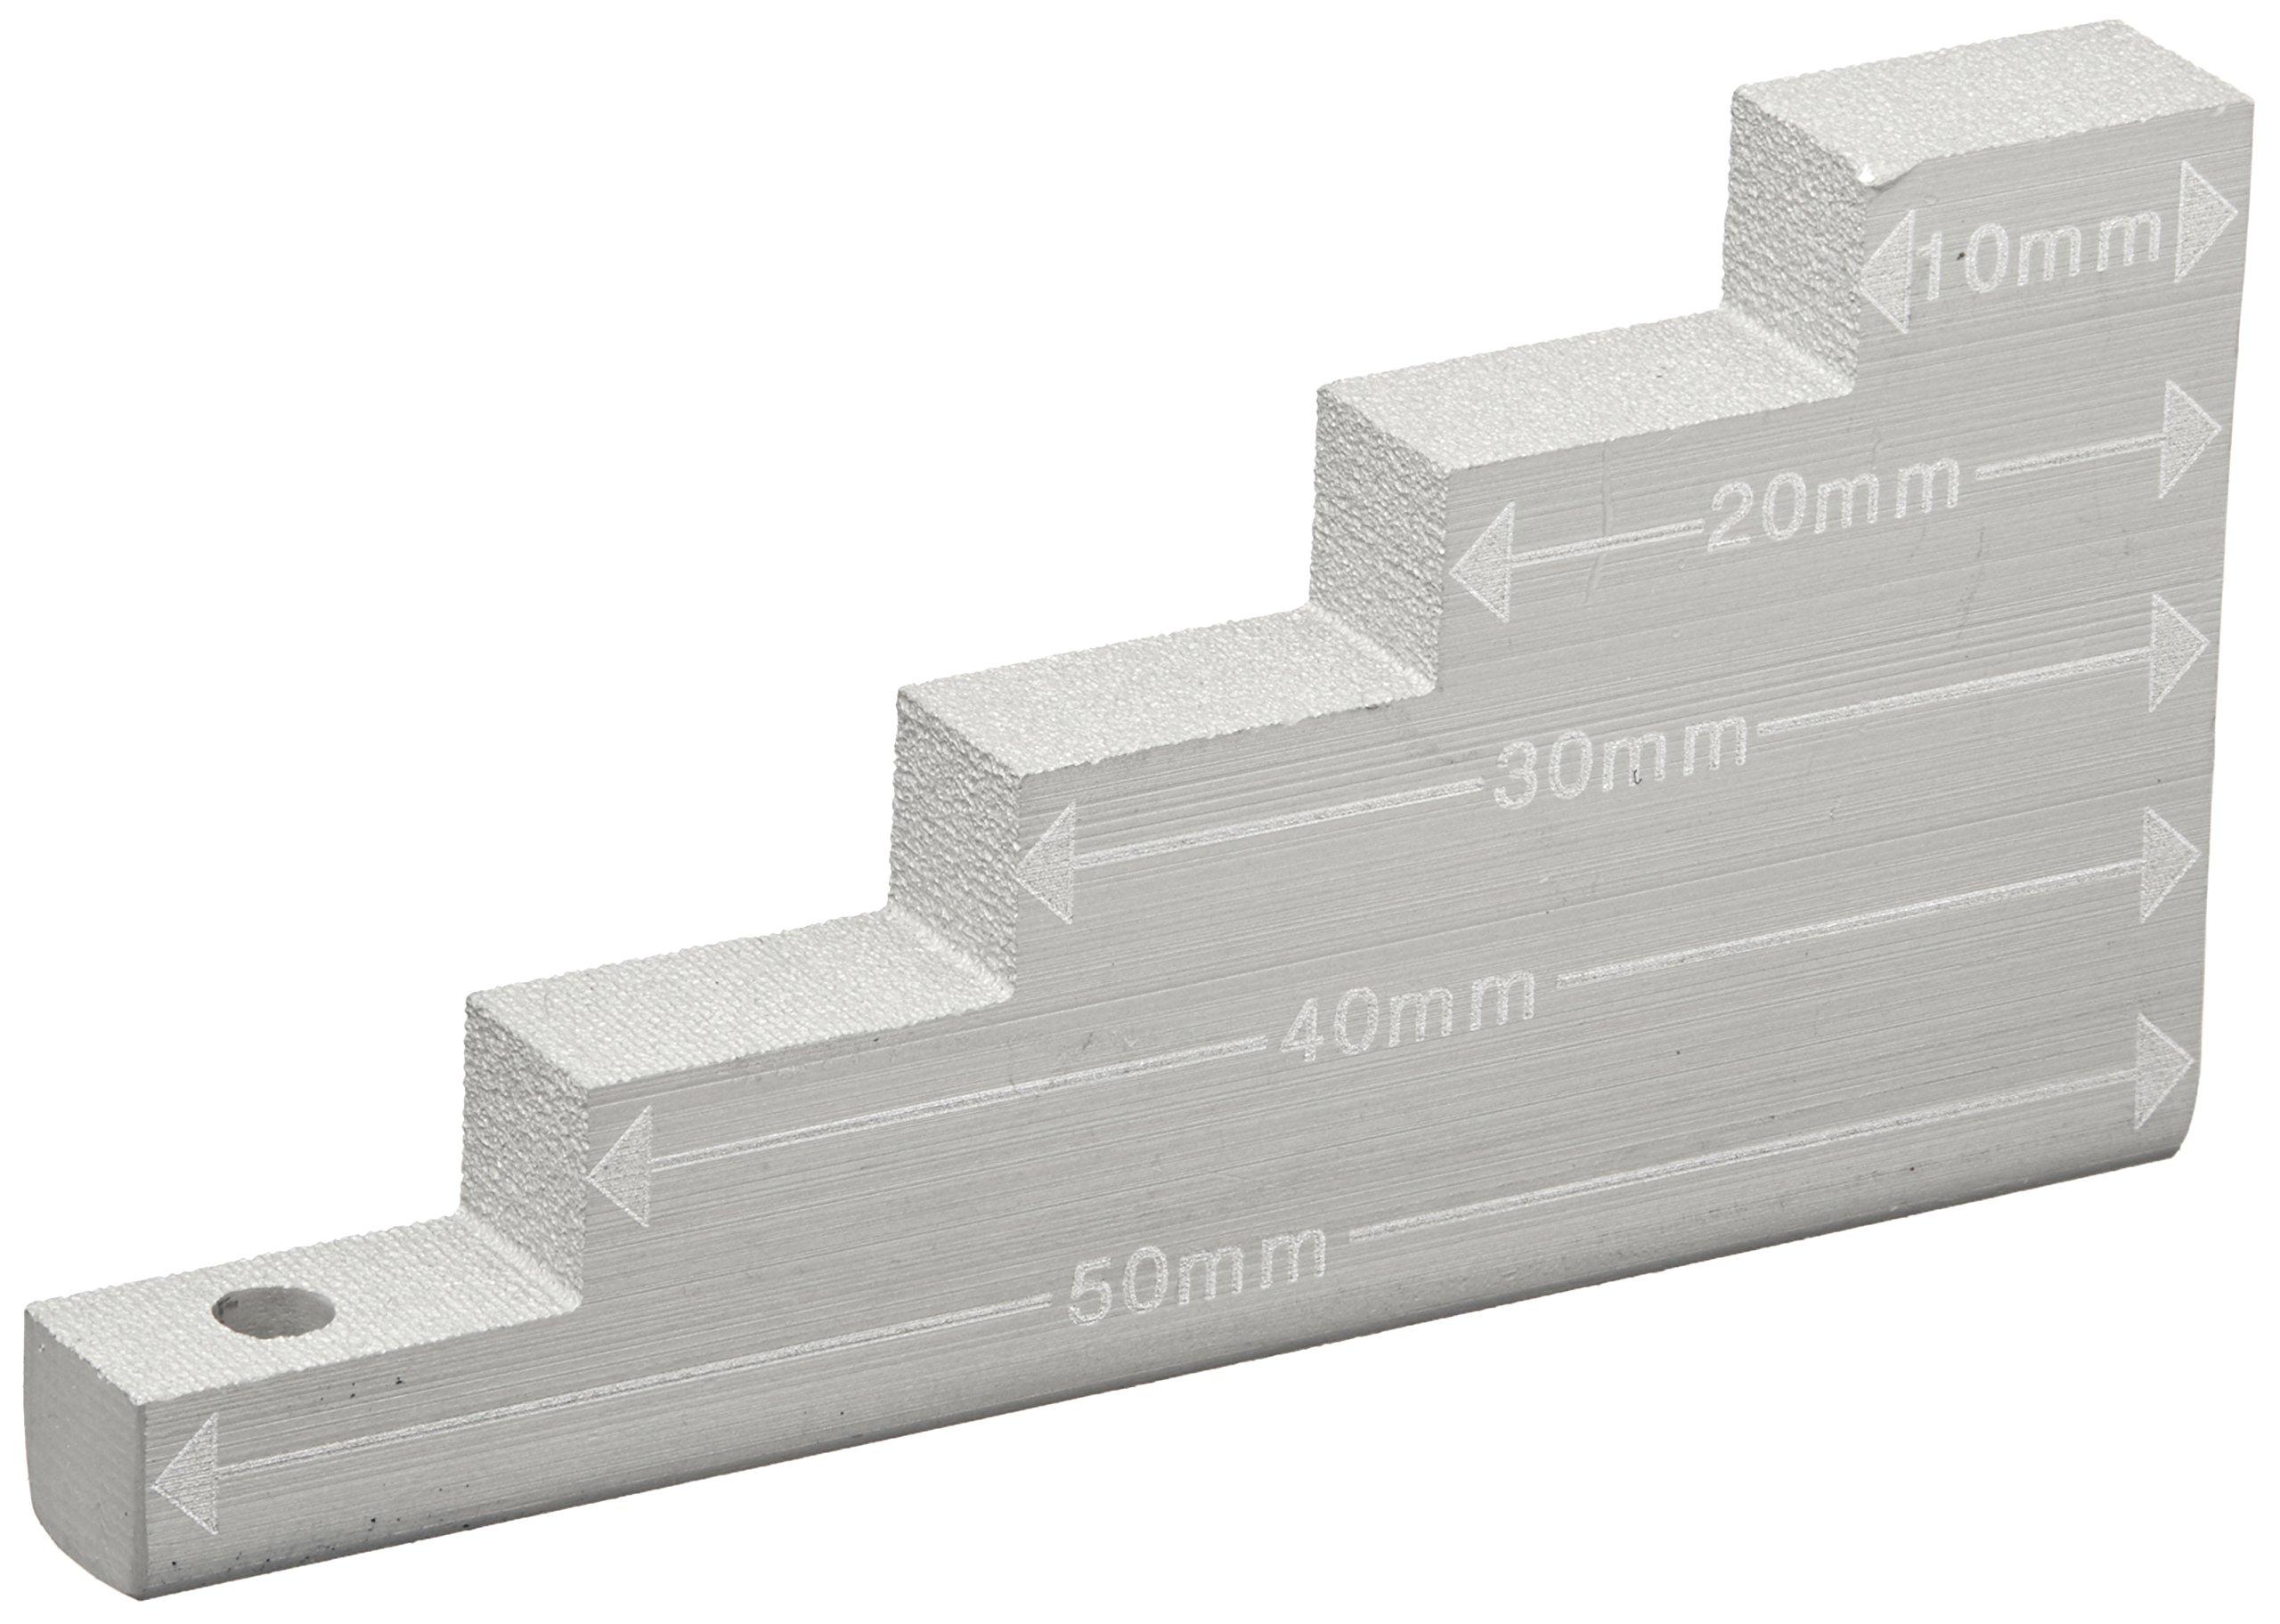 Baseline 12-1116 Skinfold Caliper, Accessory, Calibration Block only